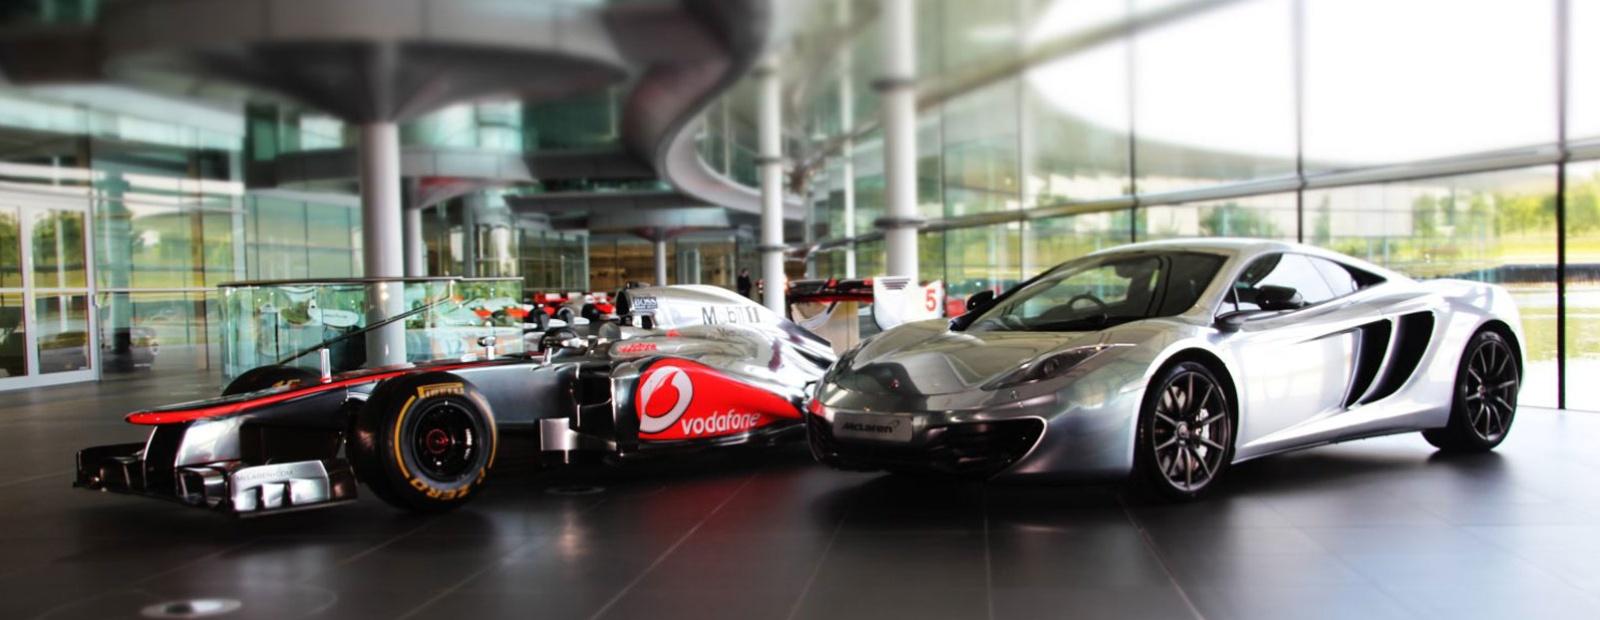 McLaren Formula 1 - New digital home for McLaren Automotive